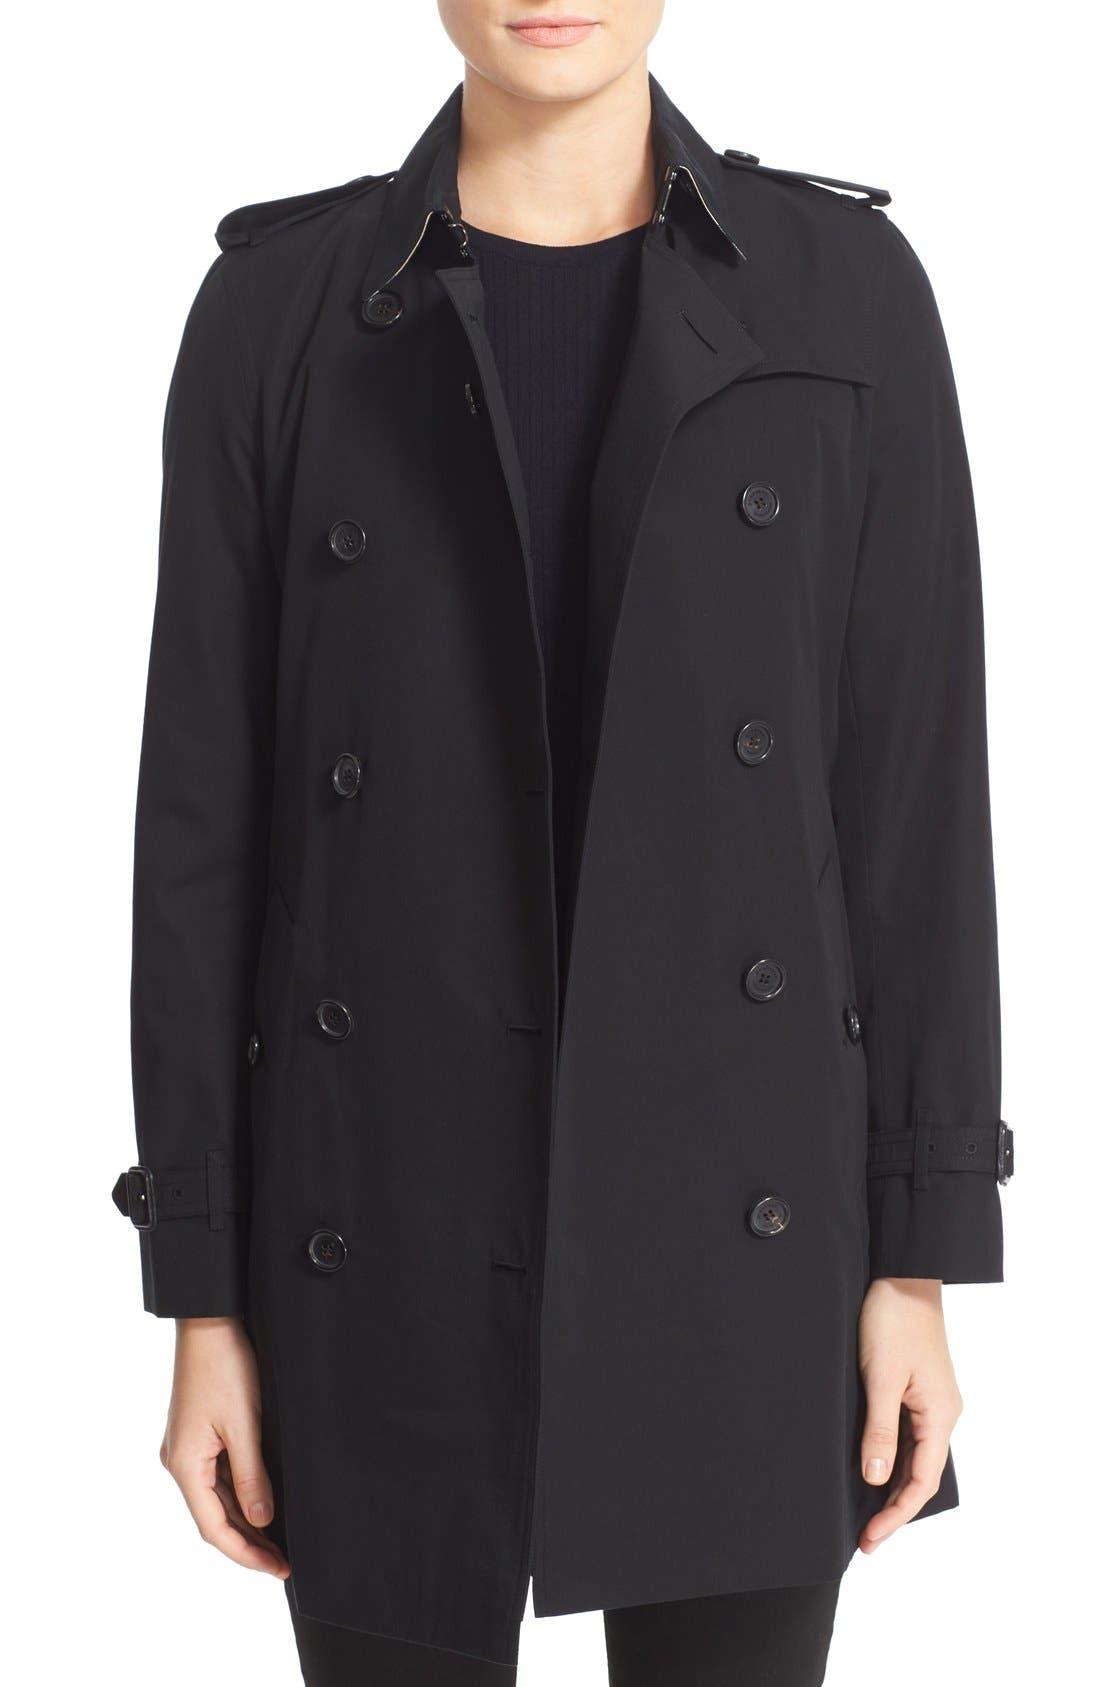 Kensington Mid Trench Coat,                             Main thumbnail 1, color,                             BLACK